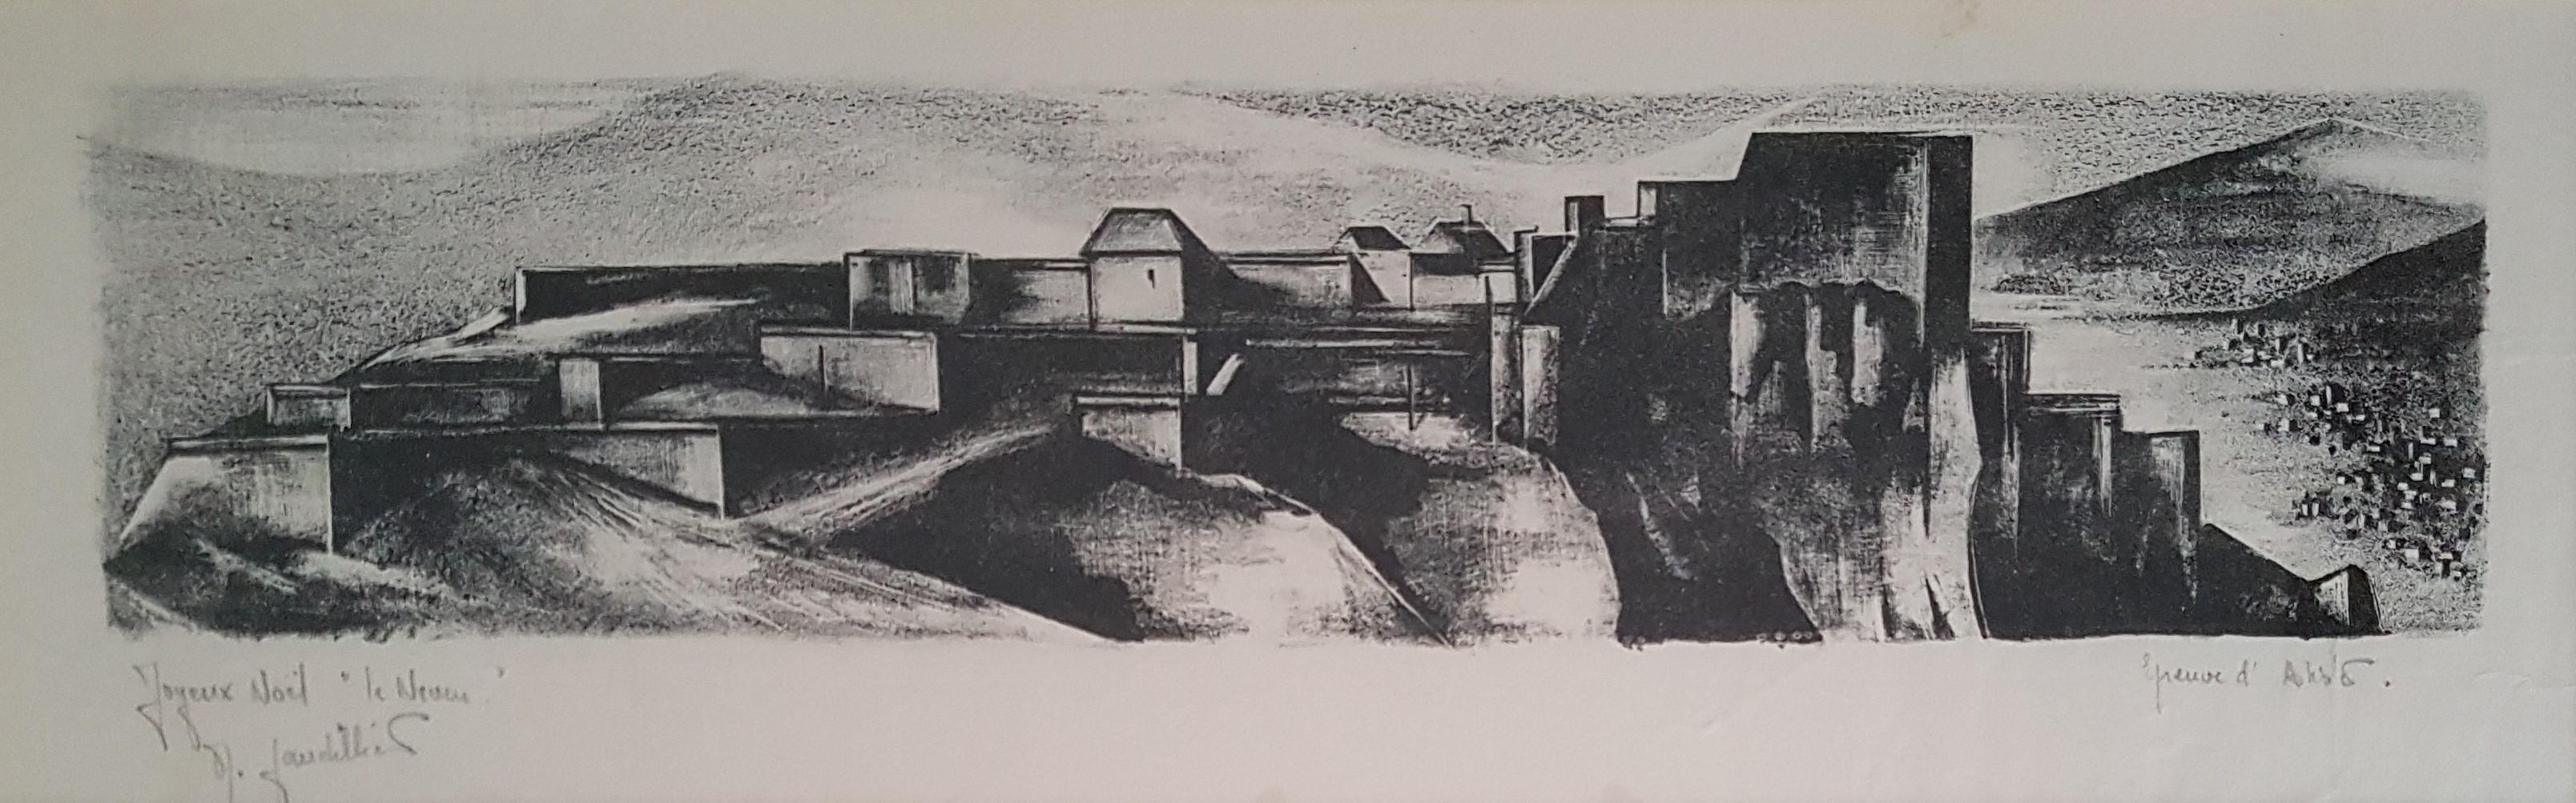 1970 La citadelle